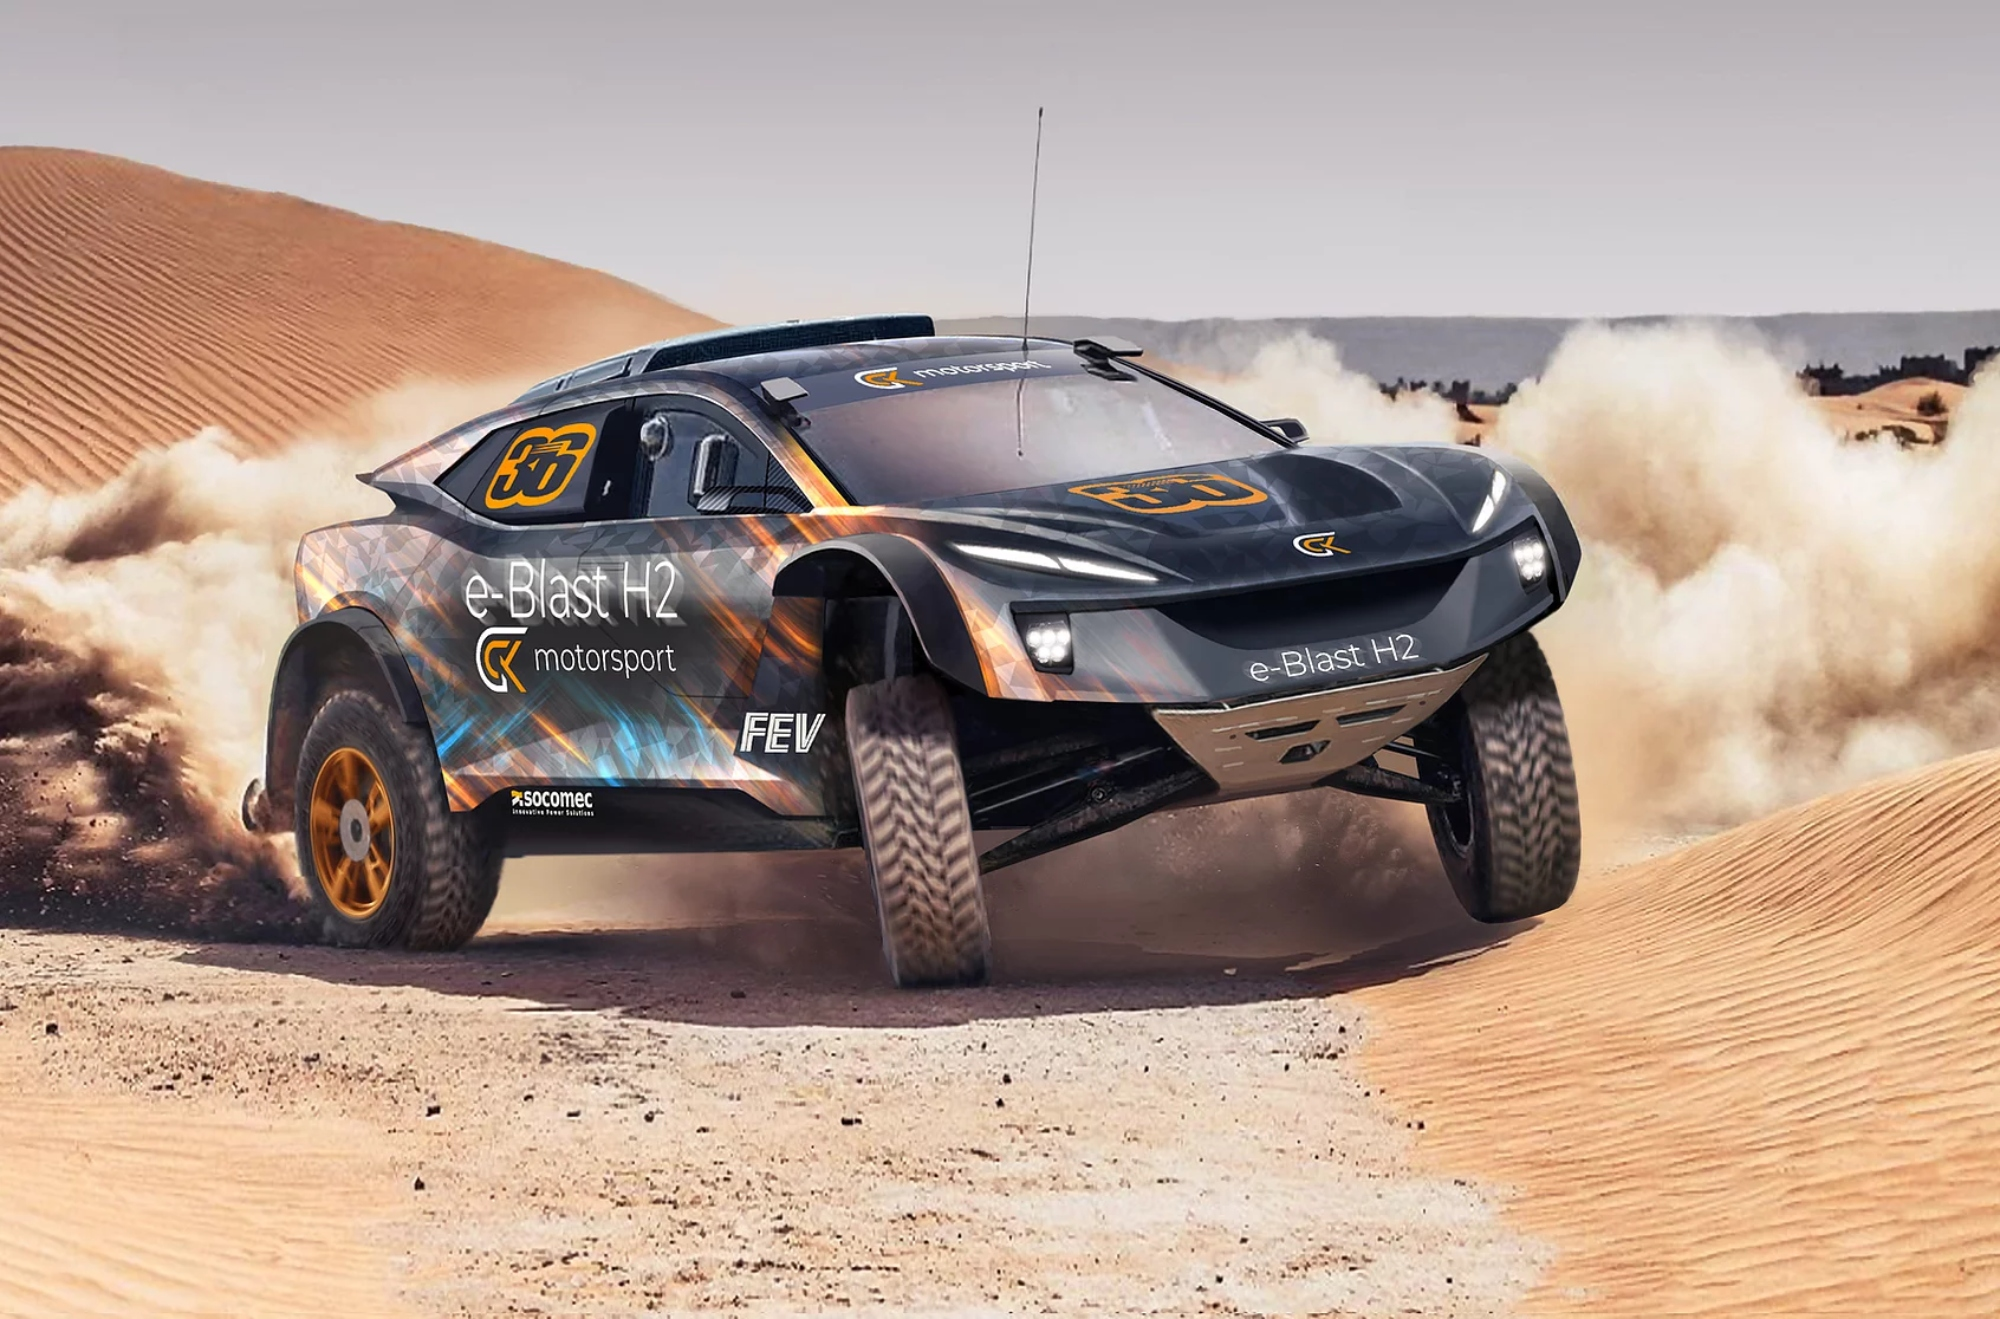 voici la future auto à hydrogène de GCK Motorsport